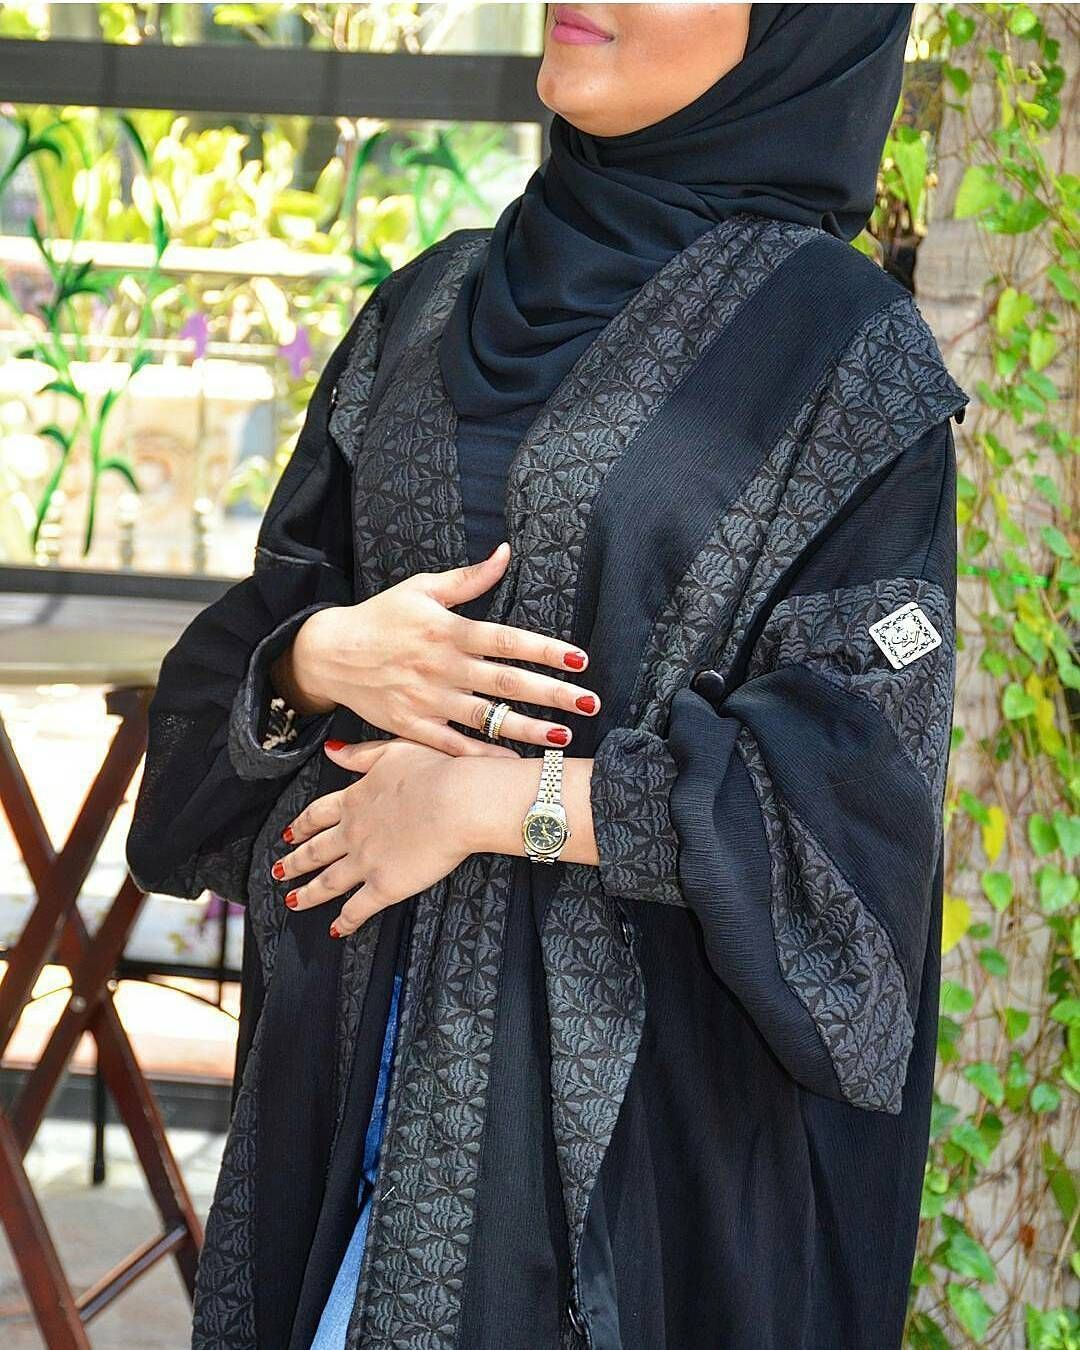 Repost Alzain Abaya With Instatoolsapp متوفرة للبيع الفوري كولكشن عيد الاضحئ المبارك من كولكشن العملي عبايه عمليه Abaya Fashion Fashion Muslimah Fashion